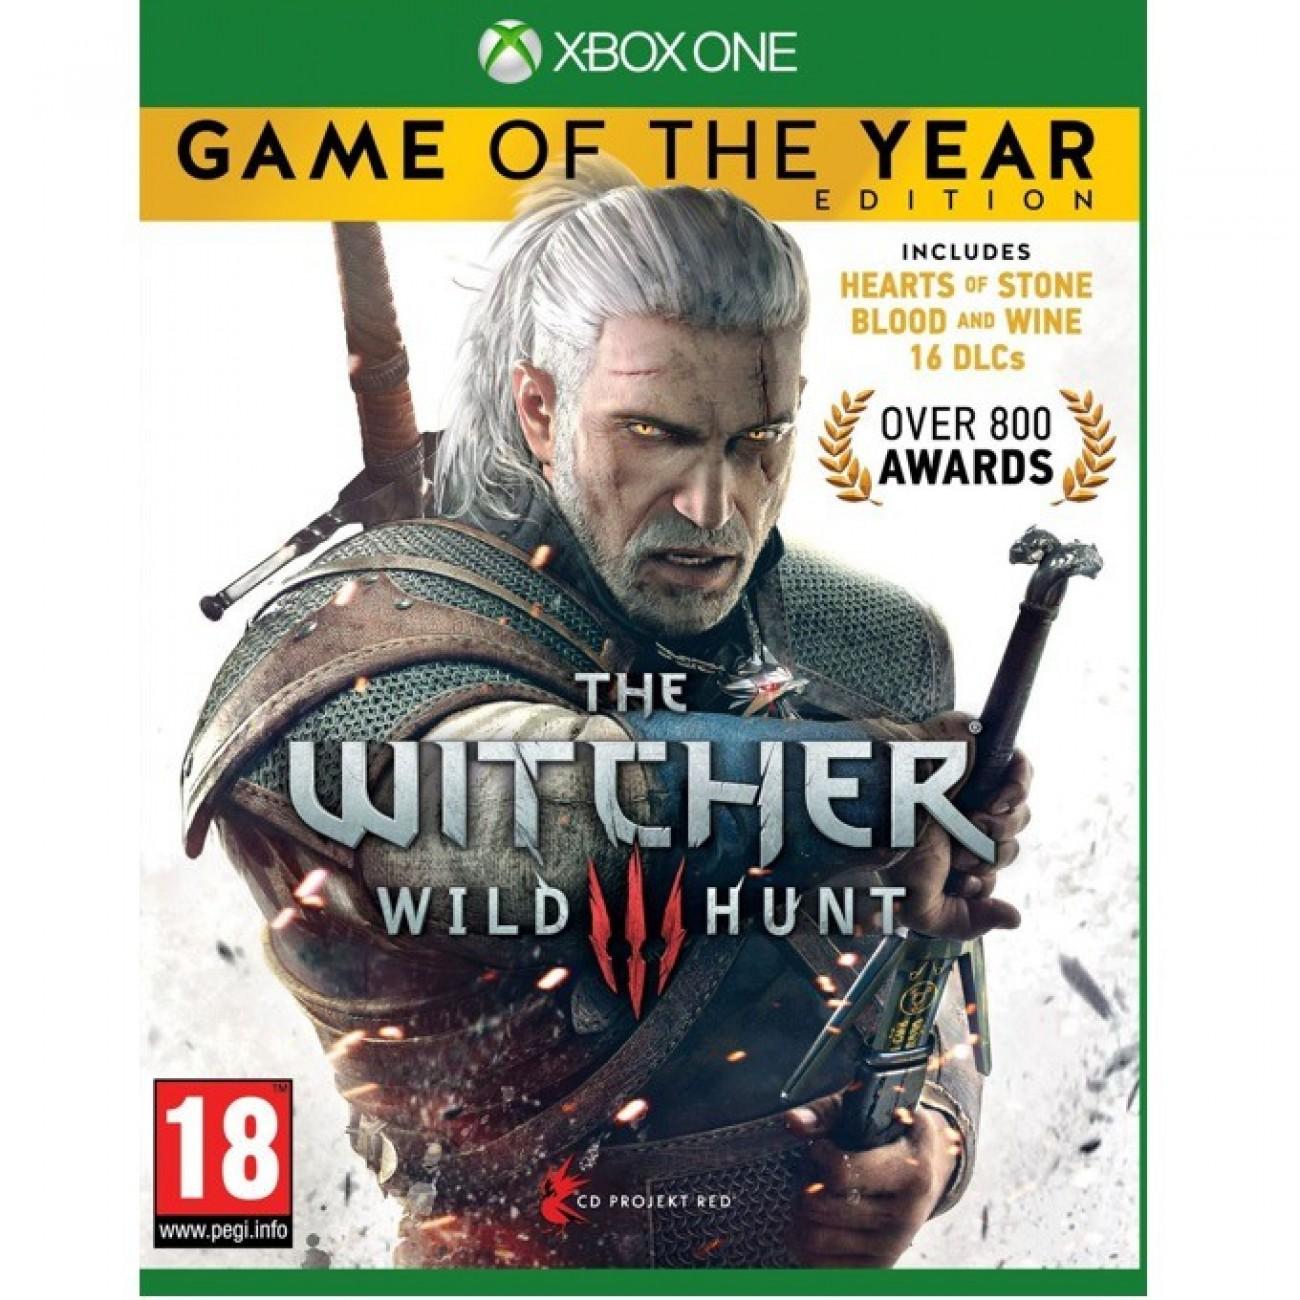 Игра за конзола The Witcher 3: Wild Hunt Game Of The Year Edition, за Xbox One в Игри за Конзоли - CD Project Red | Alleop